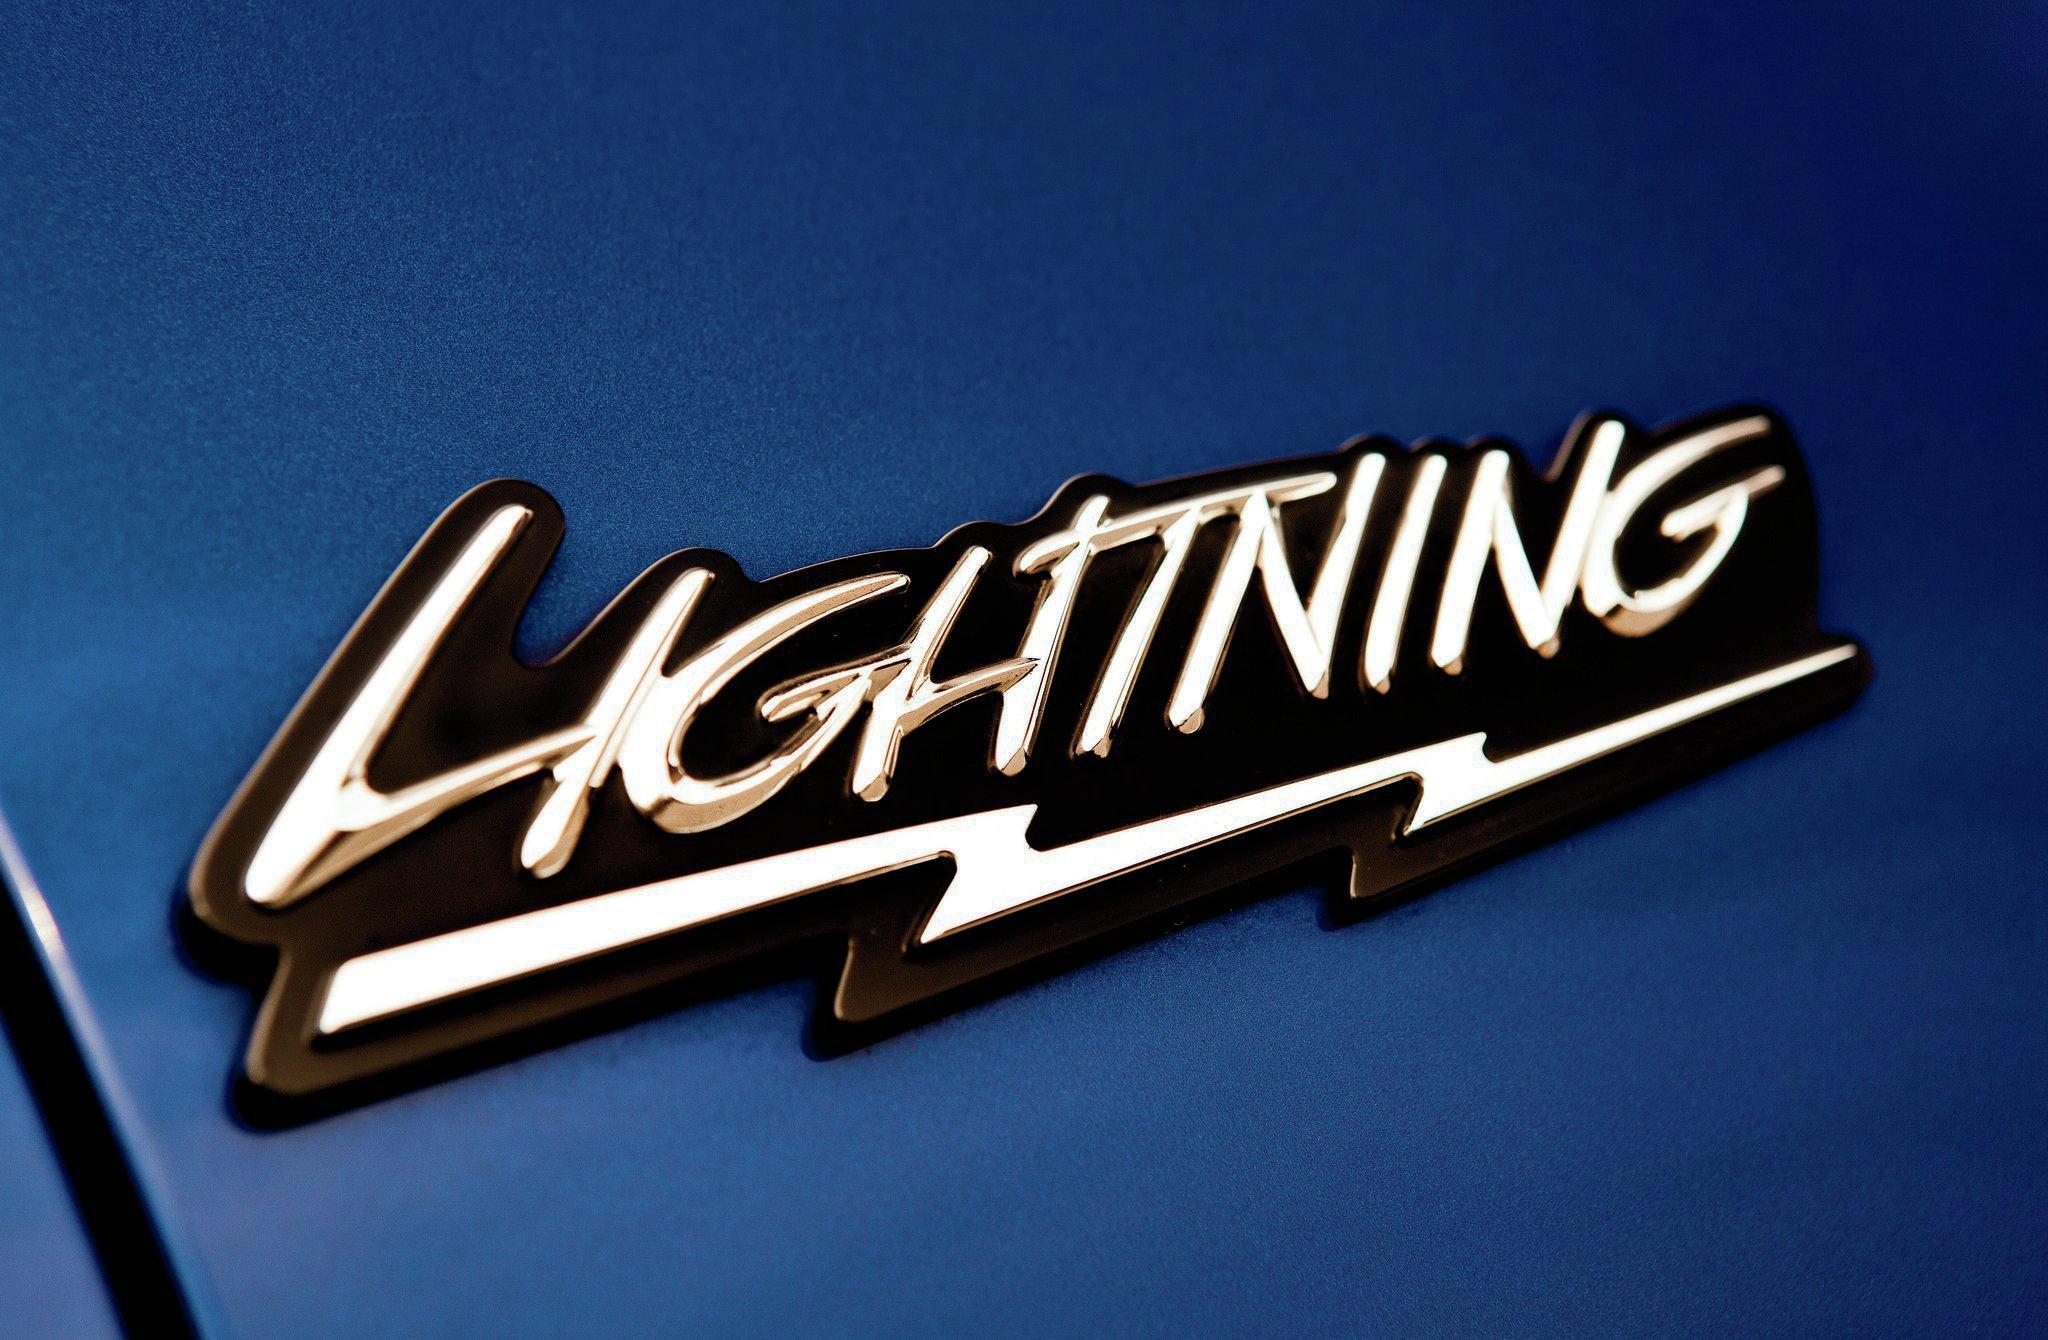 2003 Ford F 150 Lightining Logo